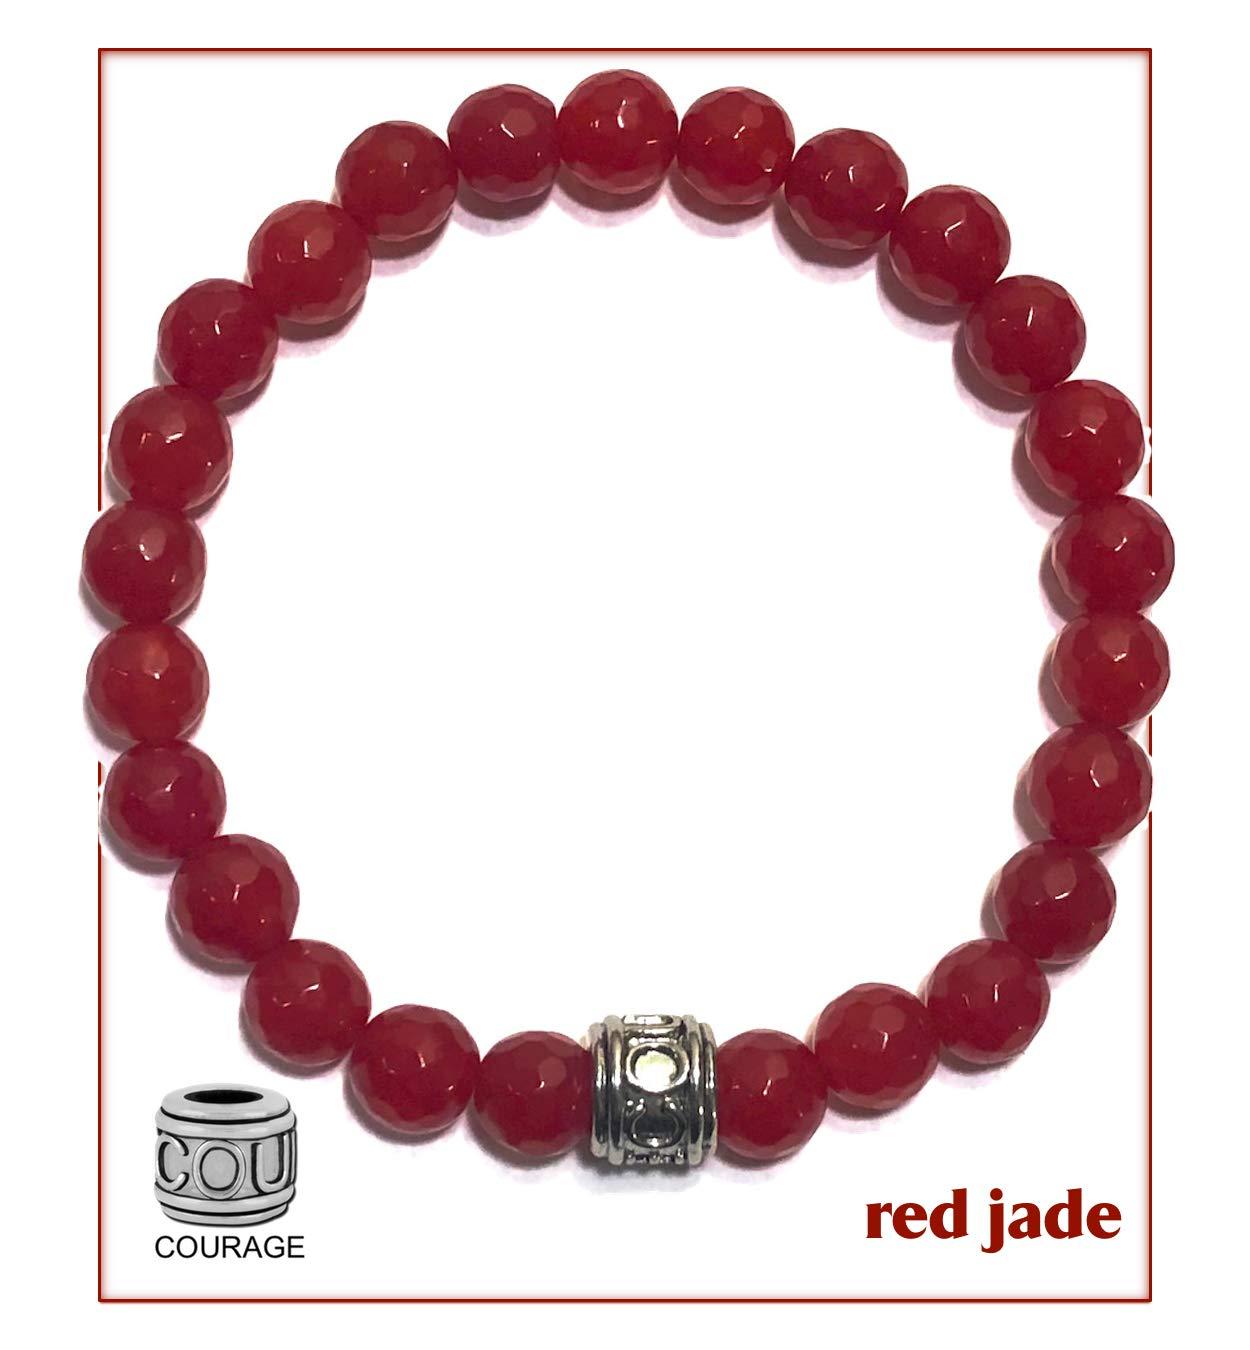 KarmaArm Mantra Bracelet | Natural Red Jade | Courage Bead | Good Luck Zen Meditation Mala Wristband | Yoga Reiki Healing Energy Boho Beaded Chakra Self-Care Wellness Jewelry & Gifts | Fearless (7.5)